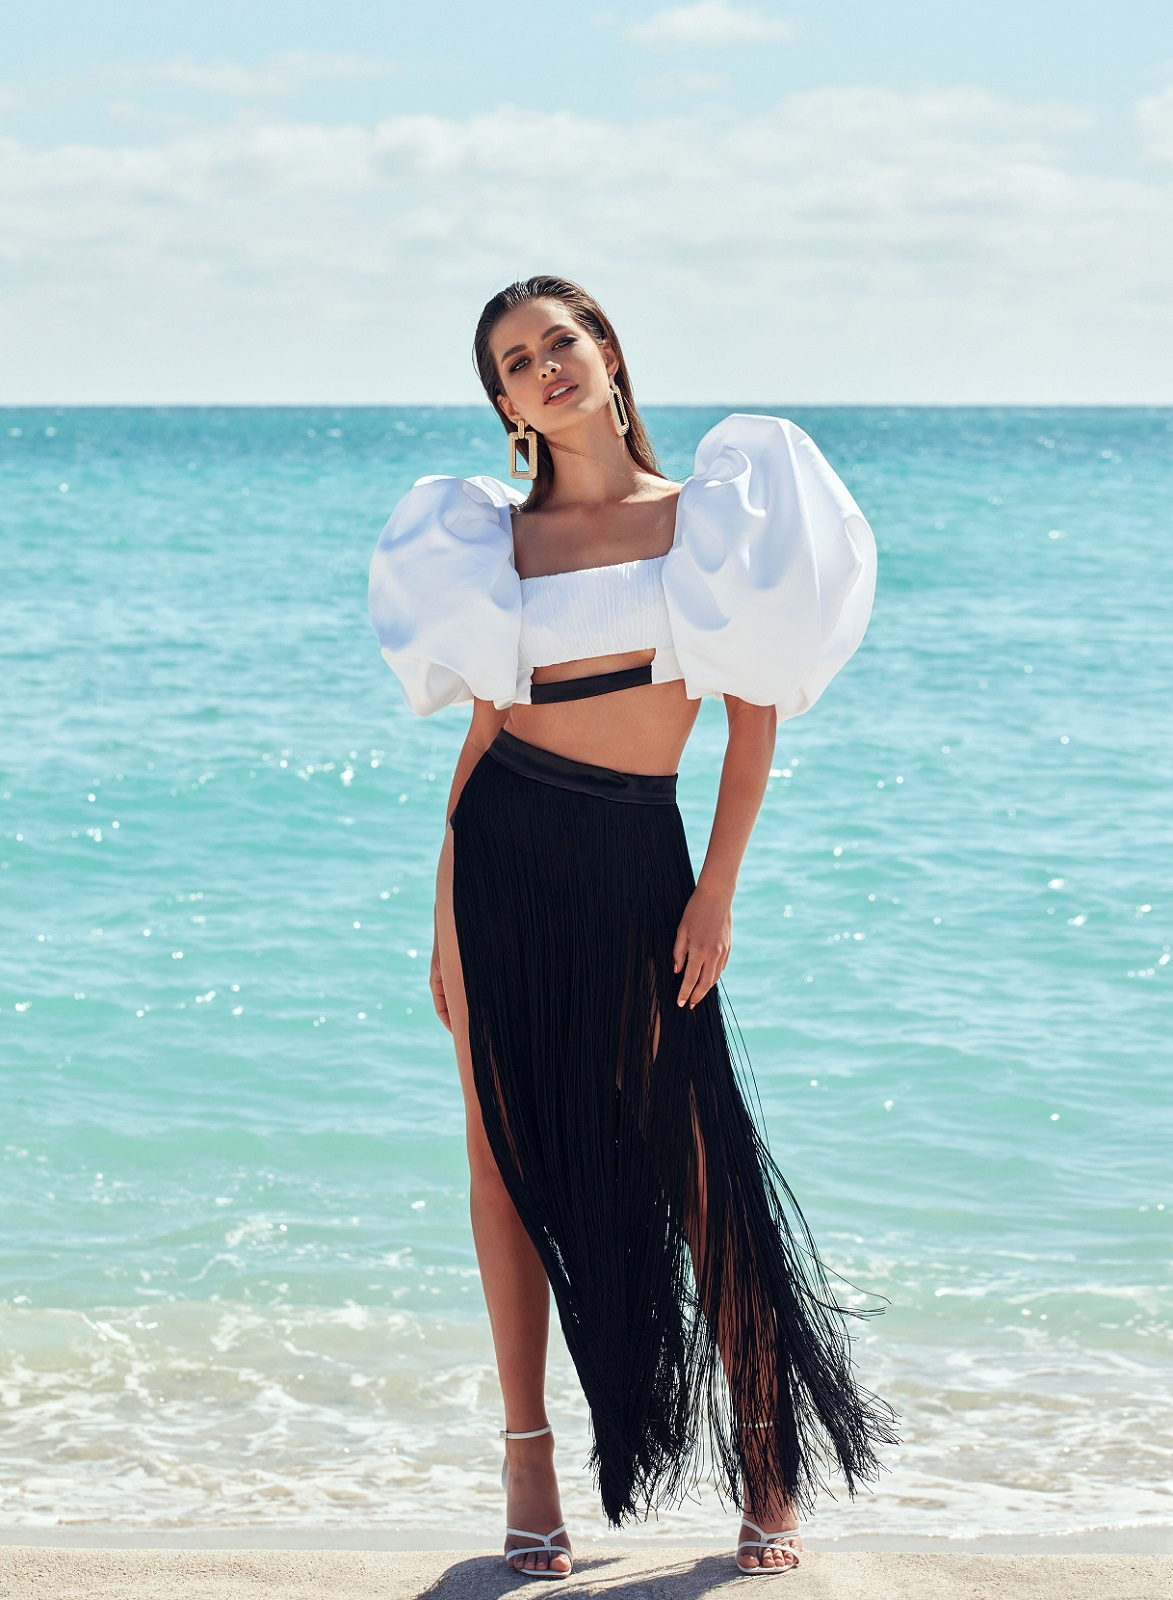 На берегу моря: История весенней digital-обложки Marie Claire-Фото 2